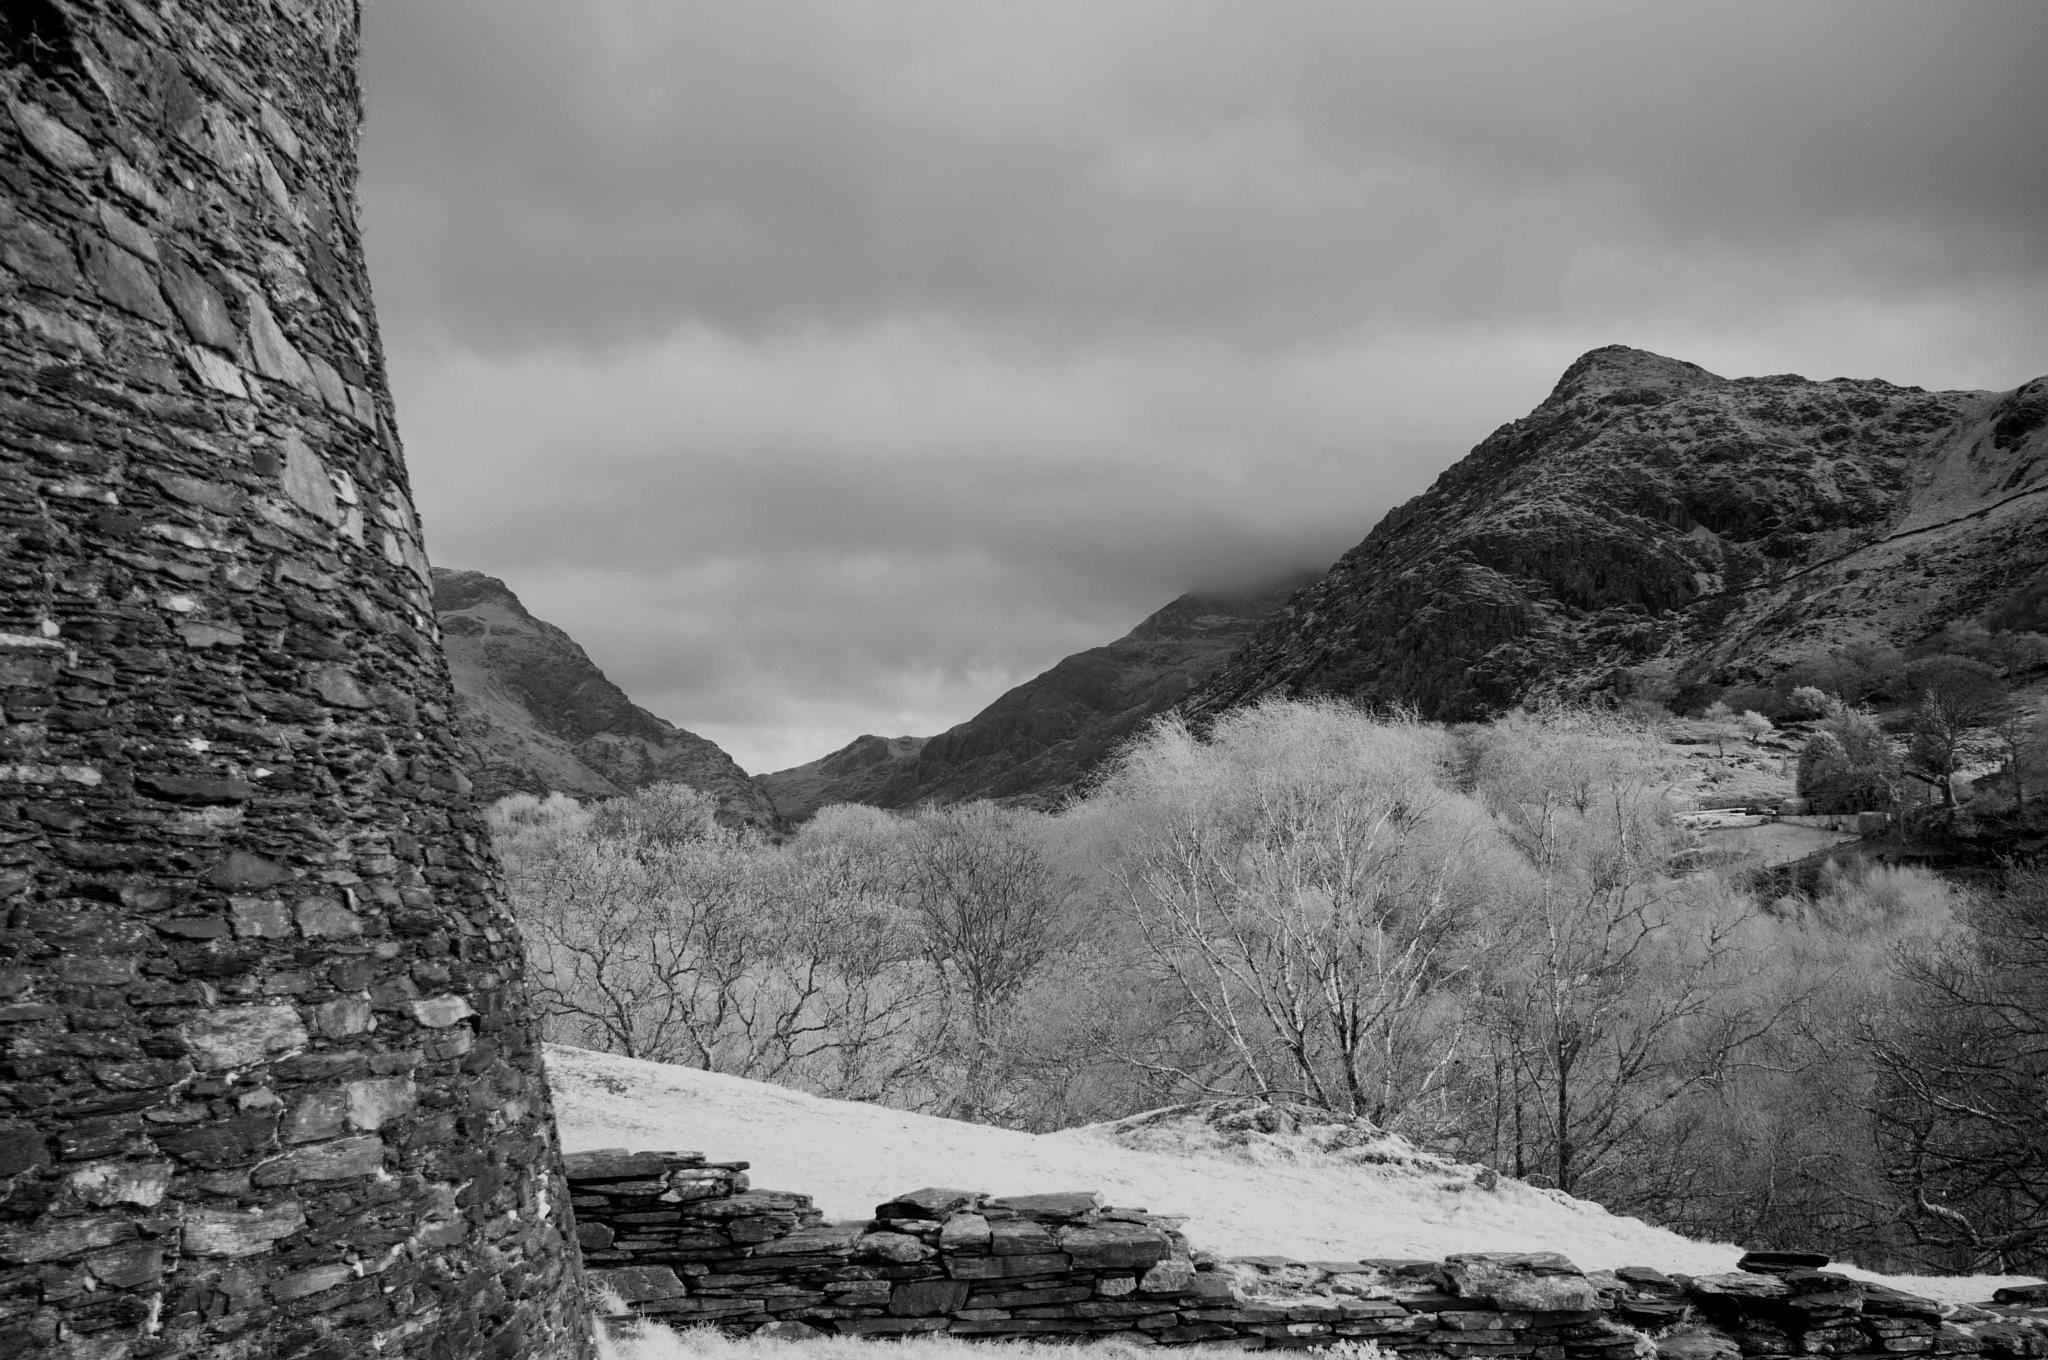 Llanberis Countryside by trevor keville